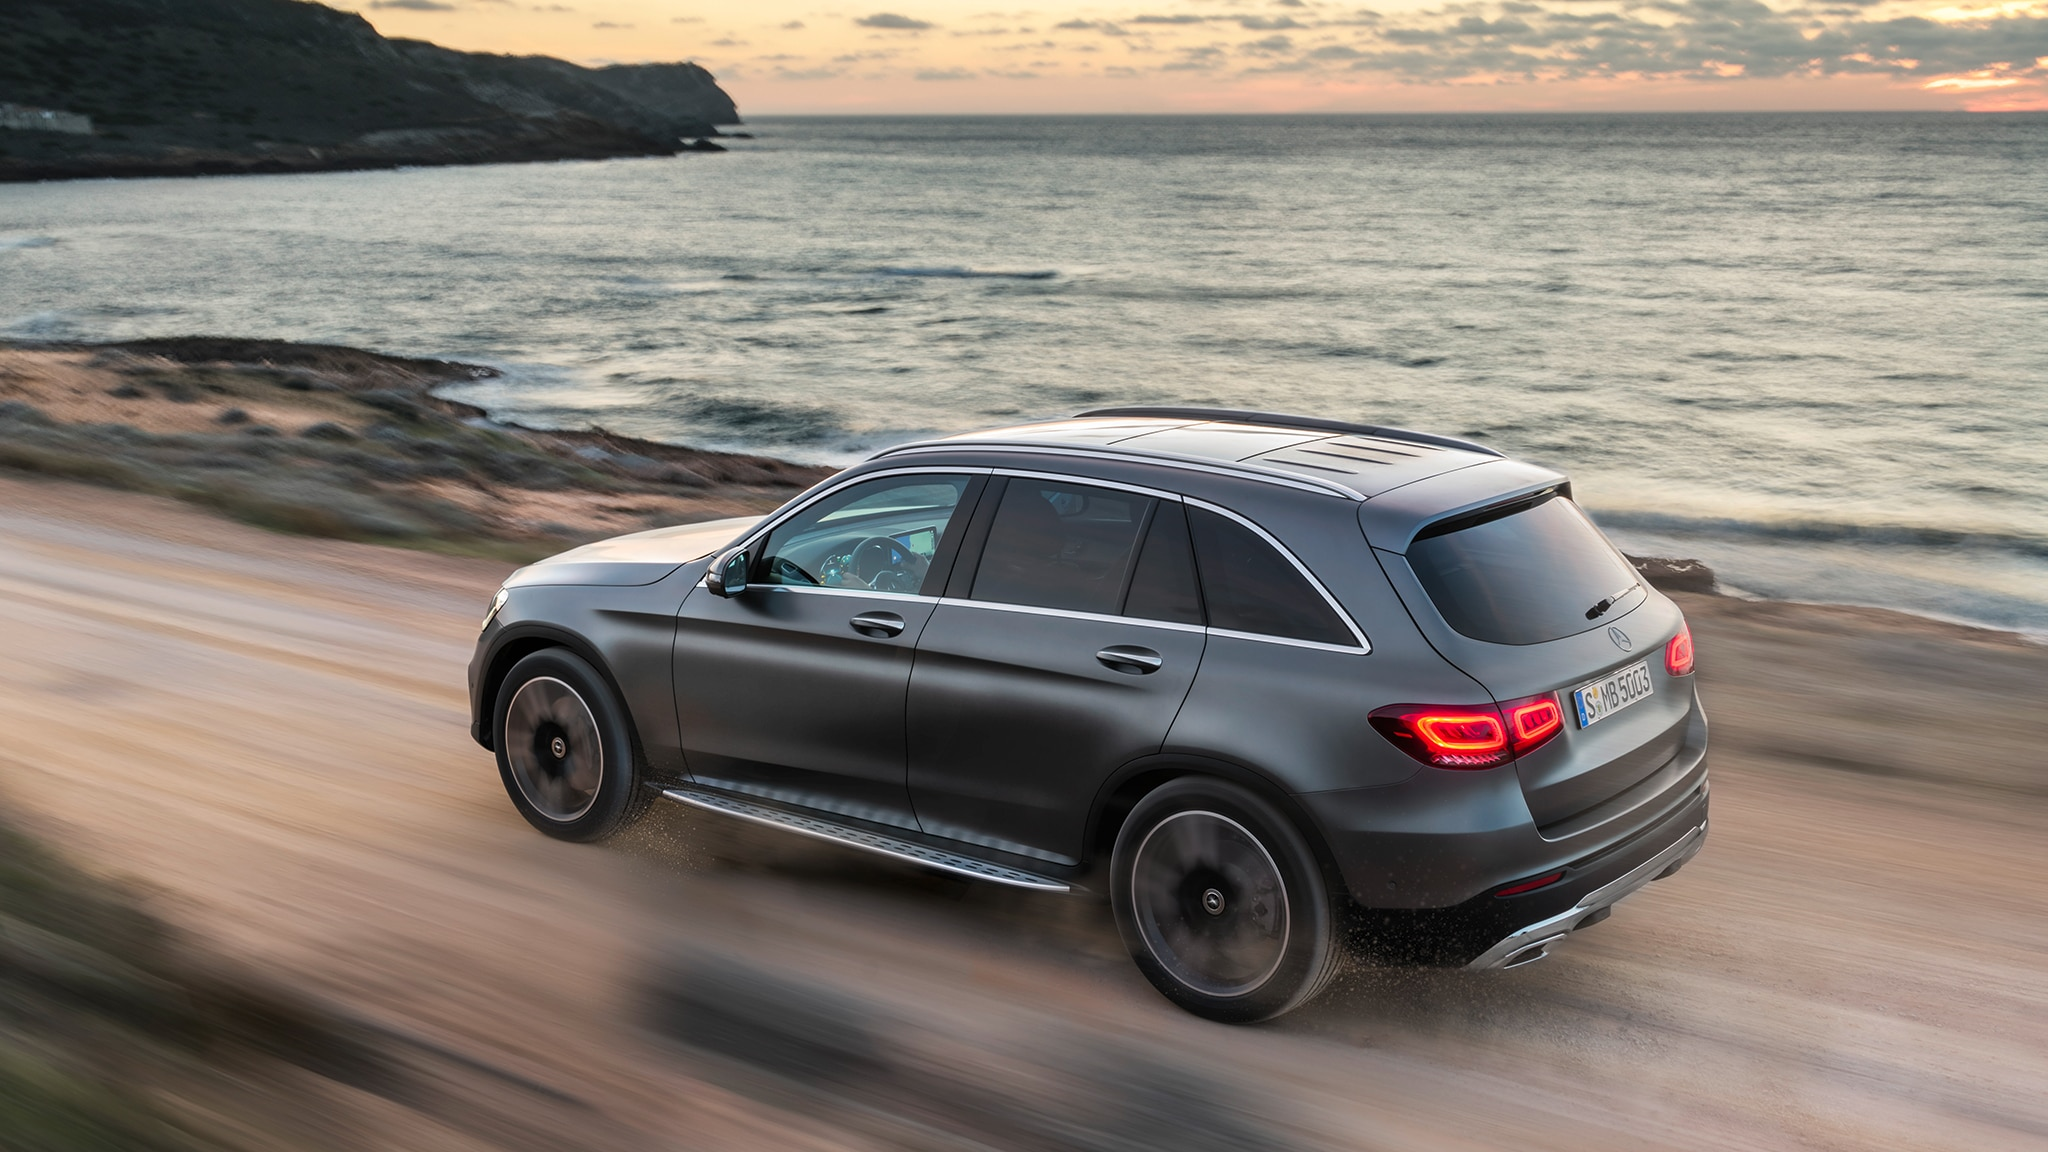 2020 Mercedes-Benz GLC-class Refresh Brings MBUX Digital